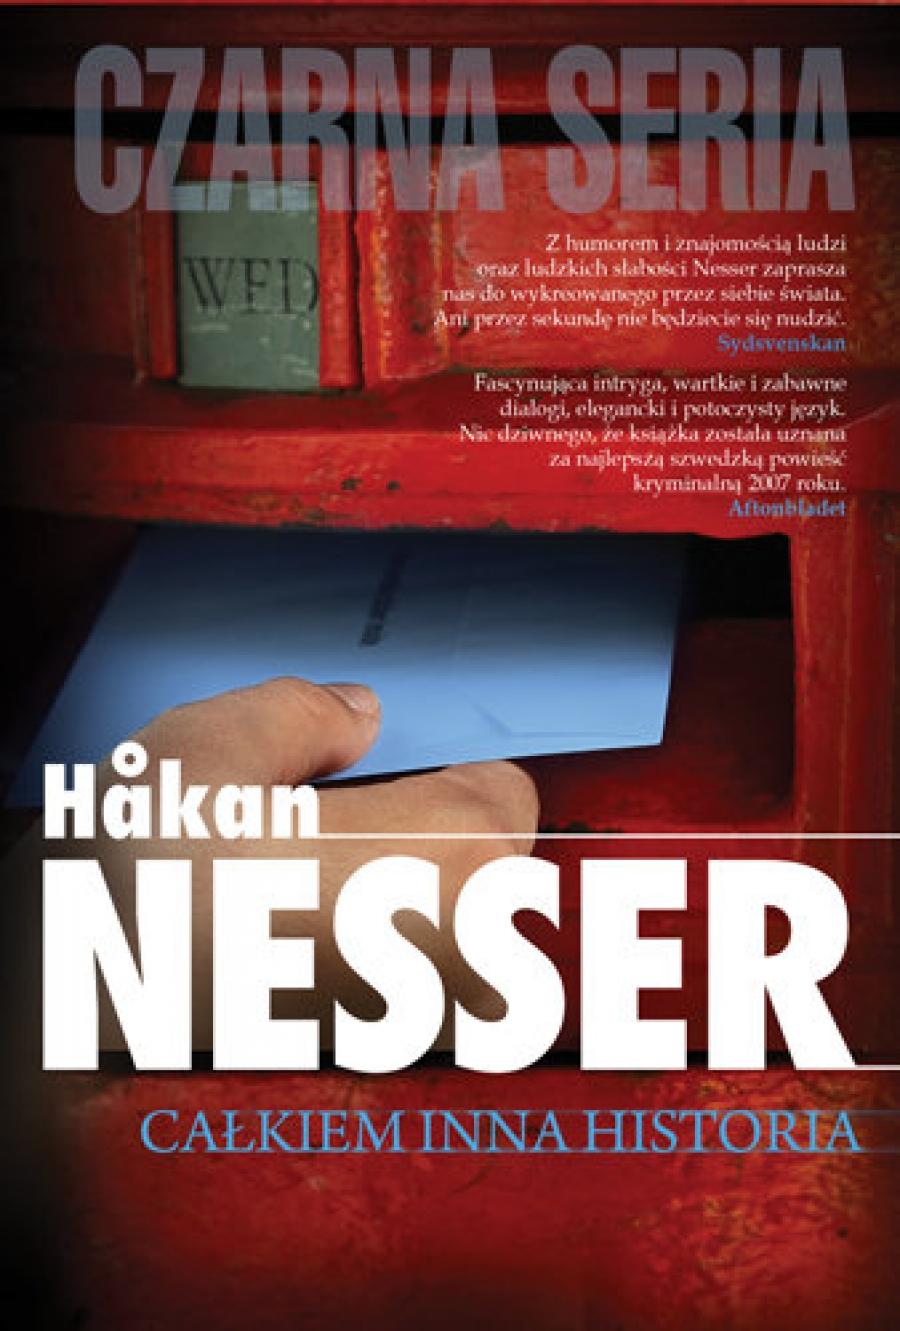 Hakan Nesser: Całkiem inna historia